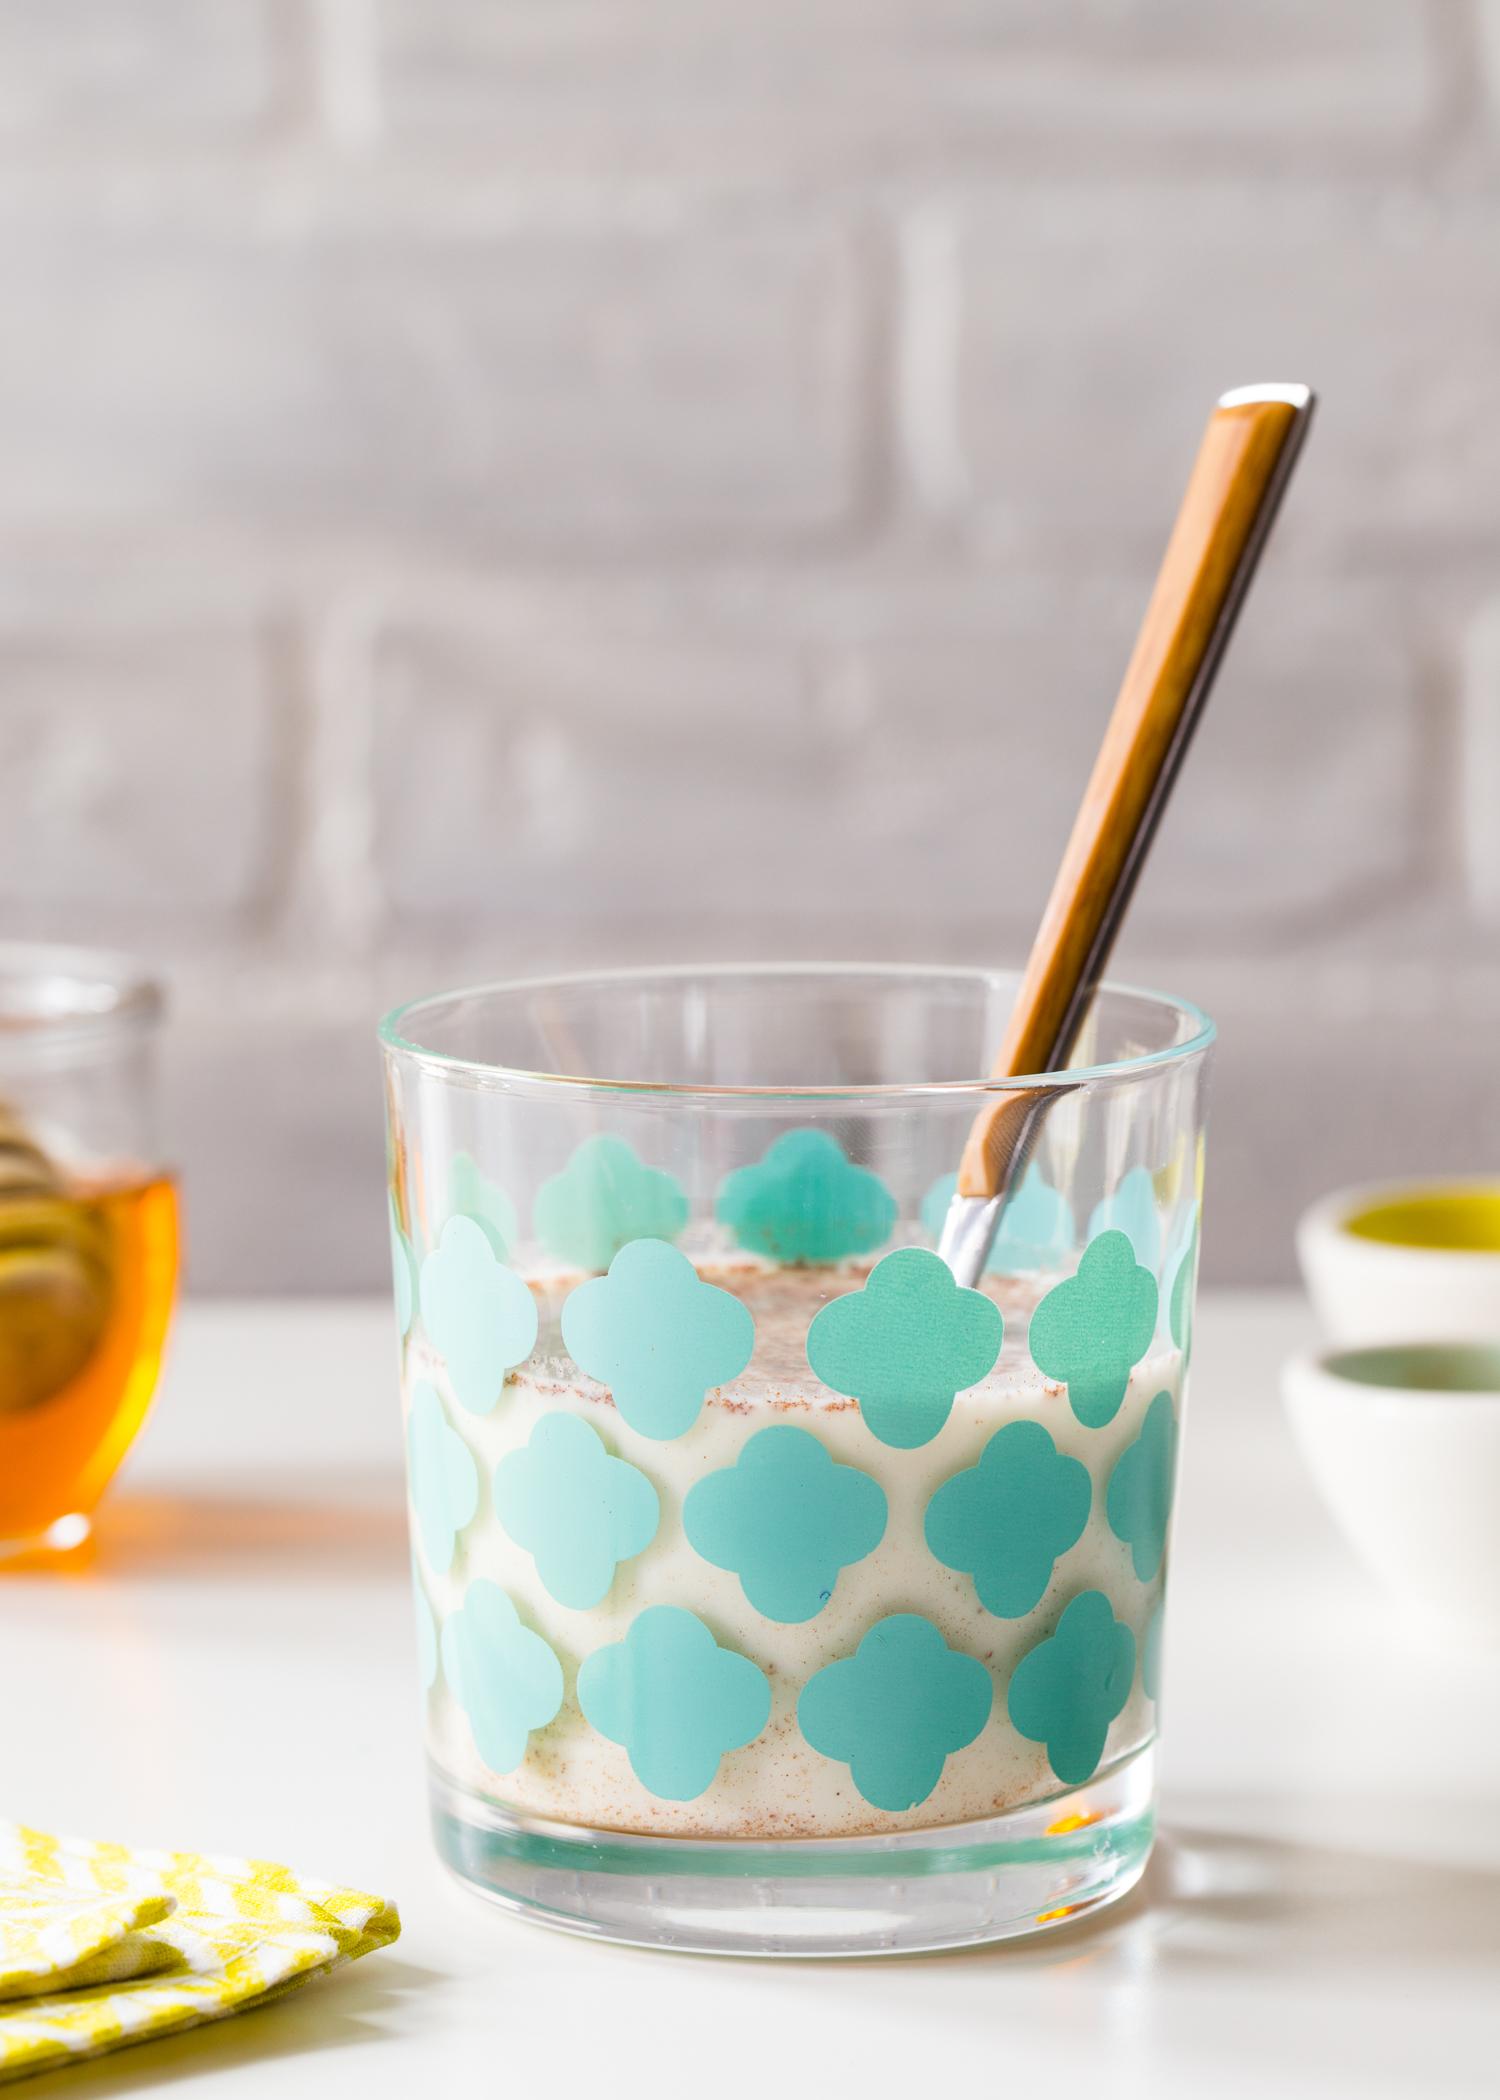 Flavored Milk - Vanilla Cinnamon Milk made with wholesome milk, pure honey, vanilla extract and cinnamon